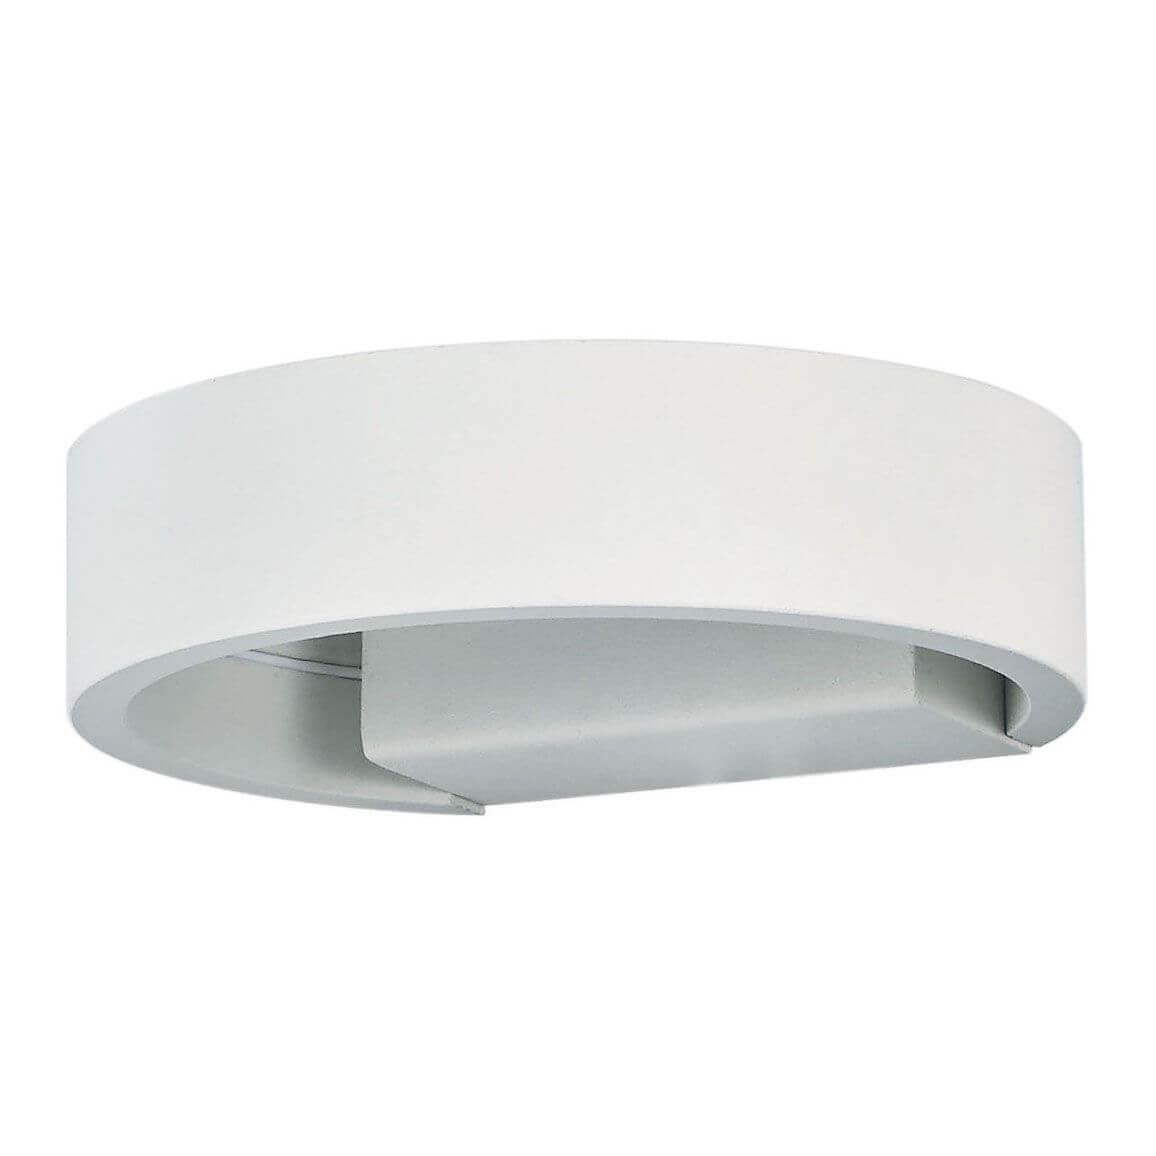 Светильник Ideal Lux Zed Ap Round Bianco Zed Bianco